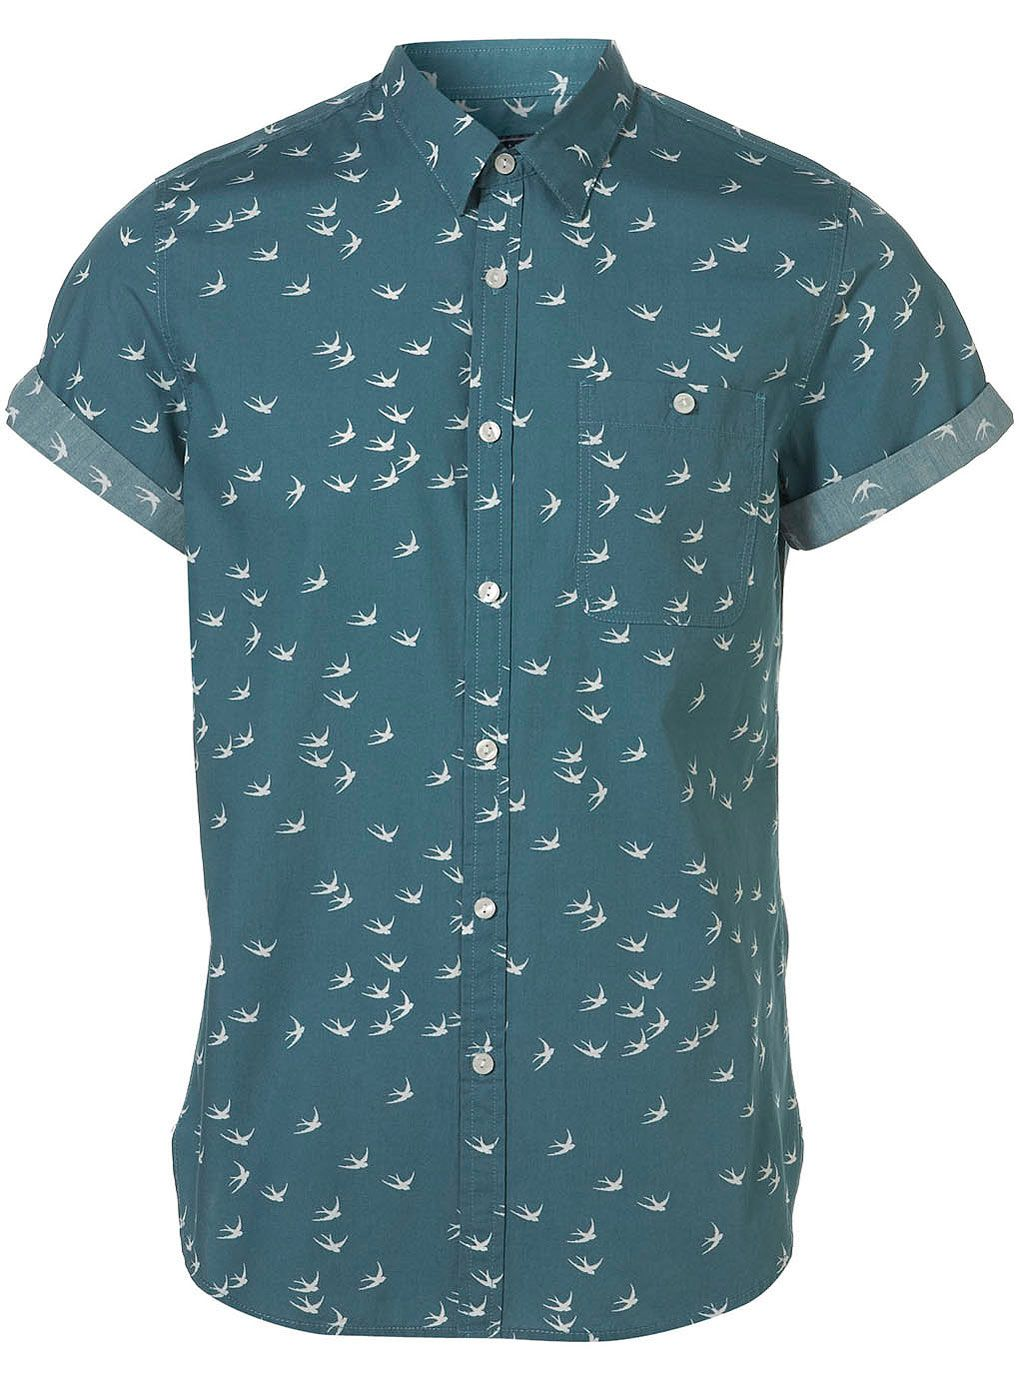 5acc5a48ac4b Topman Green Swallow Pattern Short Sleeve Shirt in Green for Men | Lyst  Mens Printed Shirts